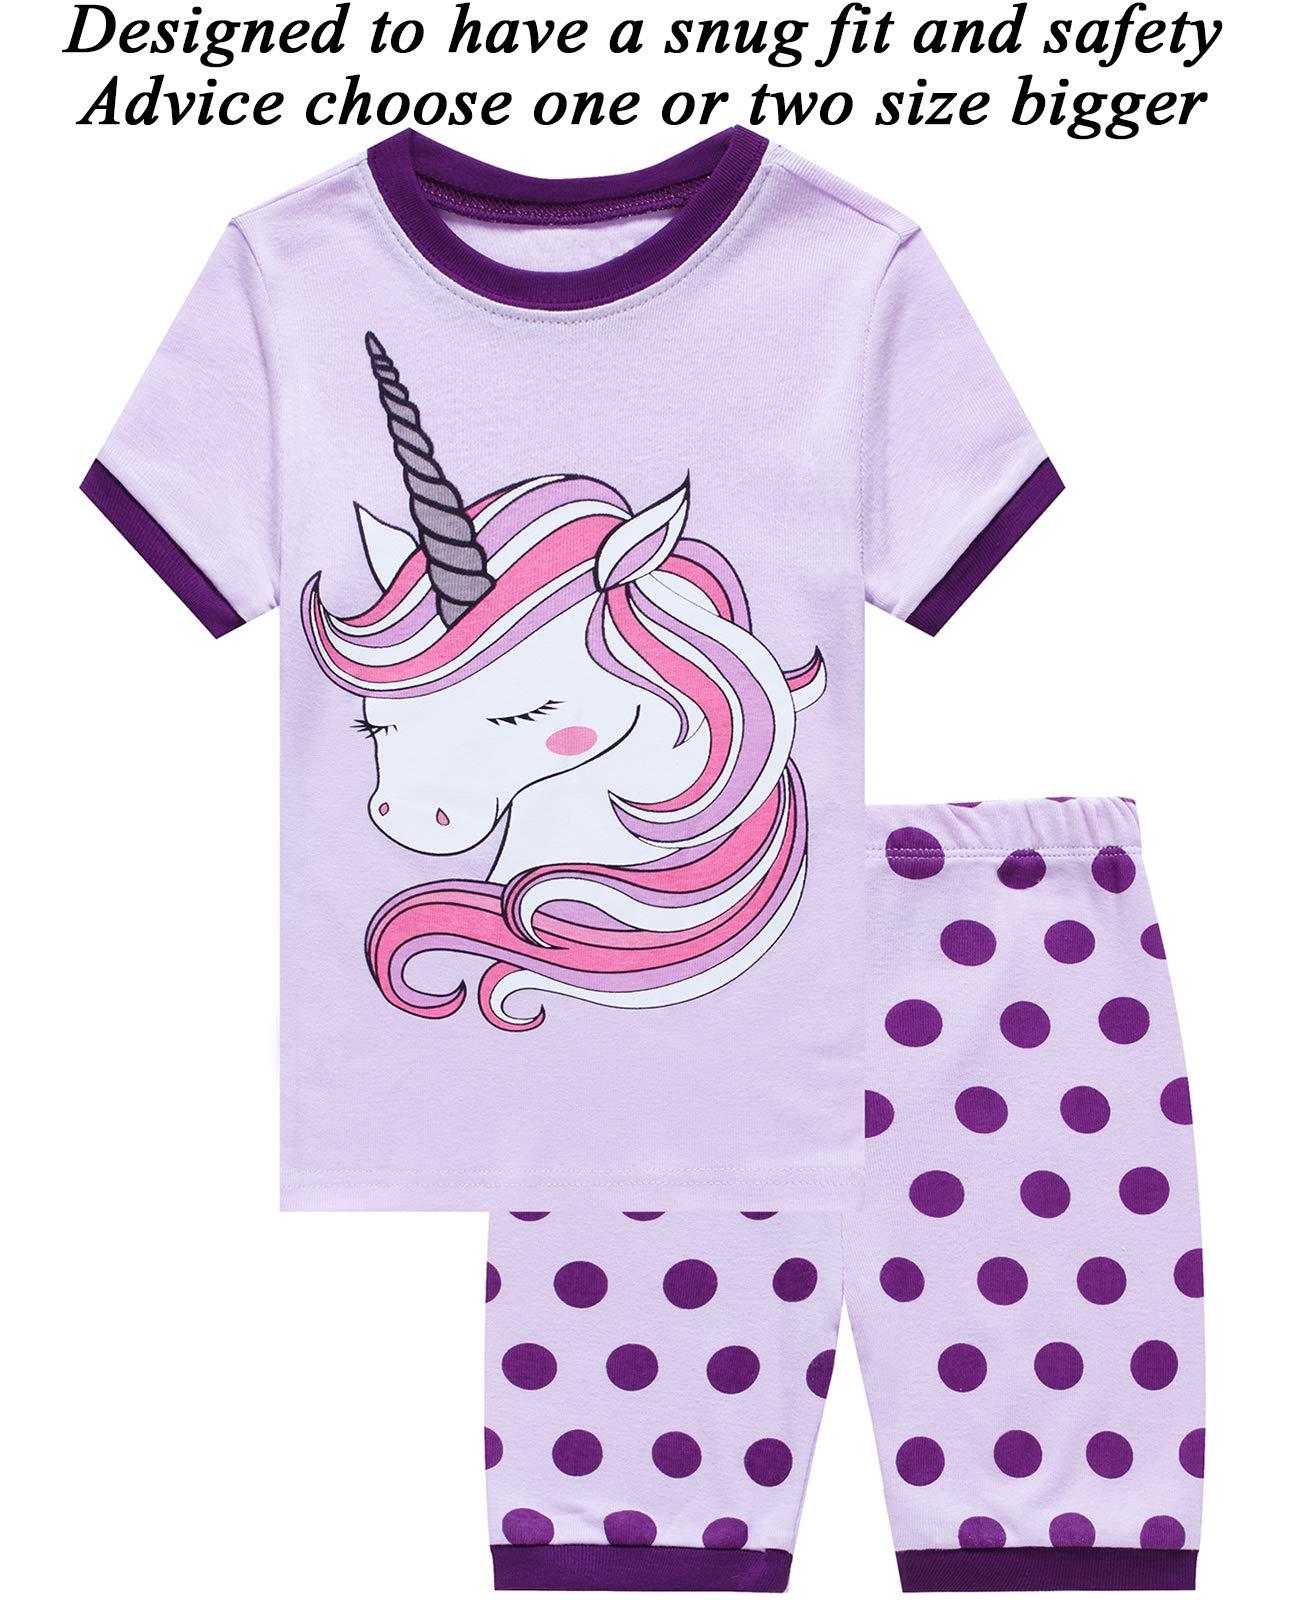 Little Pajamas Unicorn Sleepwear 100% Cotton Summer Short Toddler Pjs Clothes Shirts Purple 4T